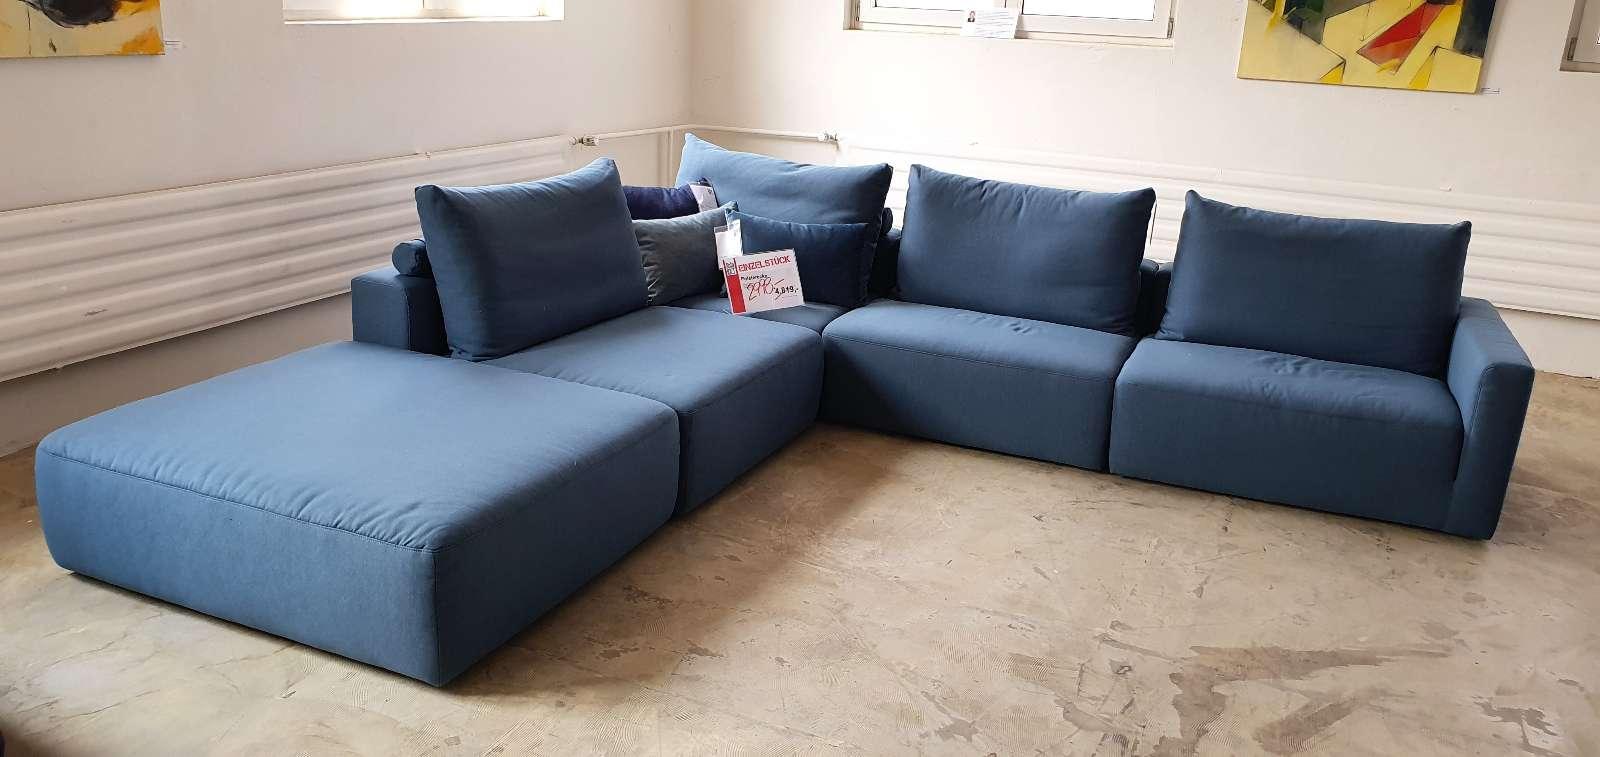 Sofa Loft – Bigsofa blau